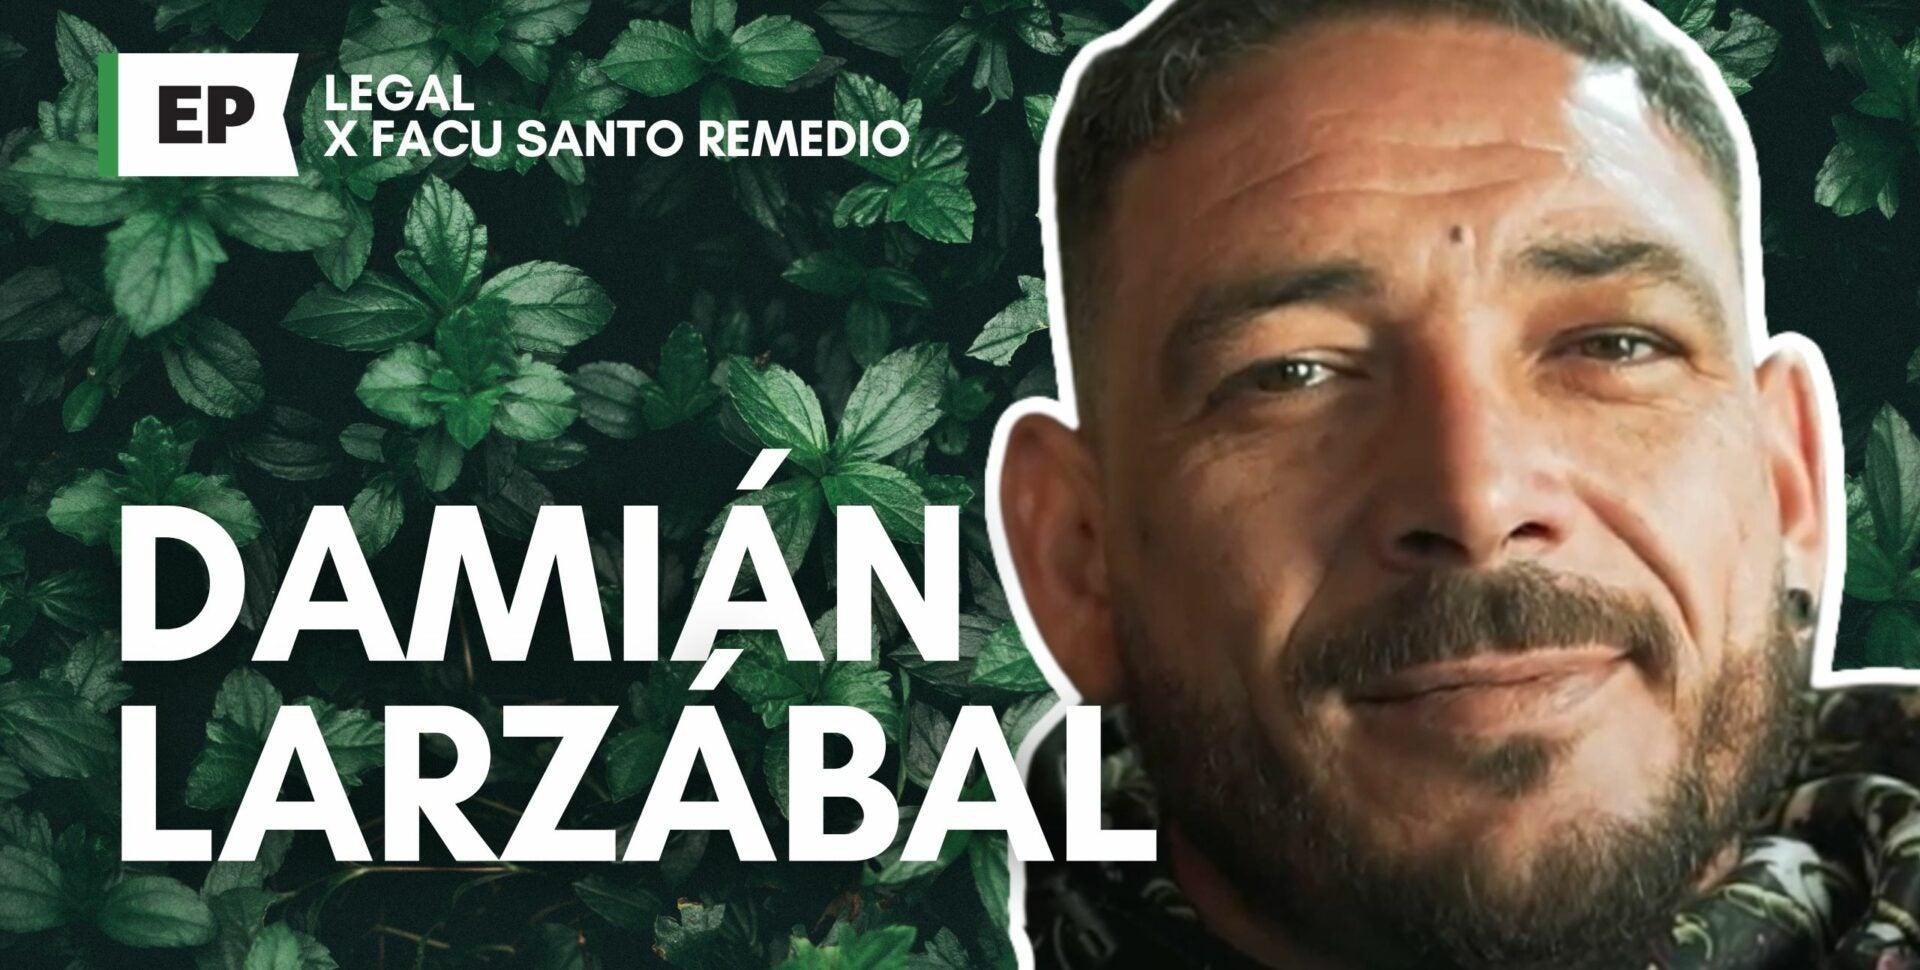 Damián Larzábal legal